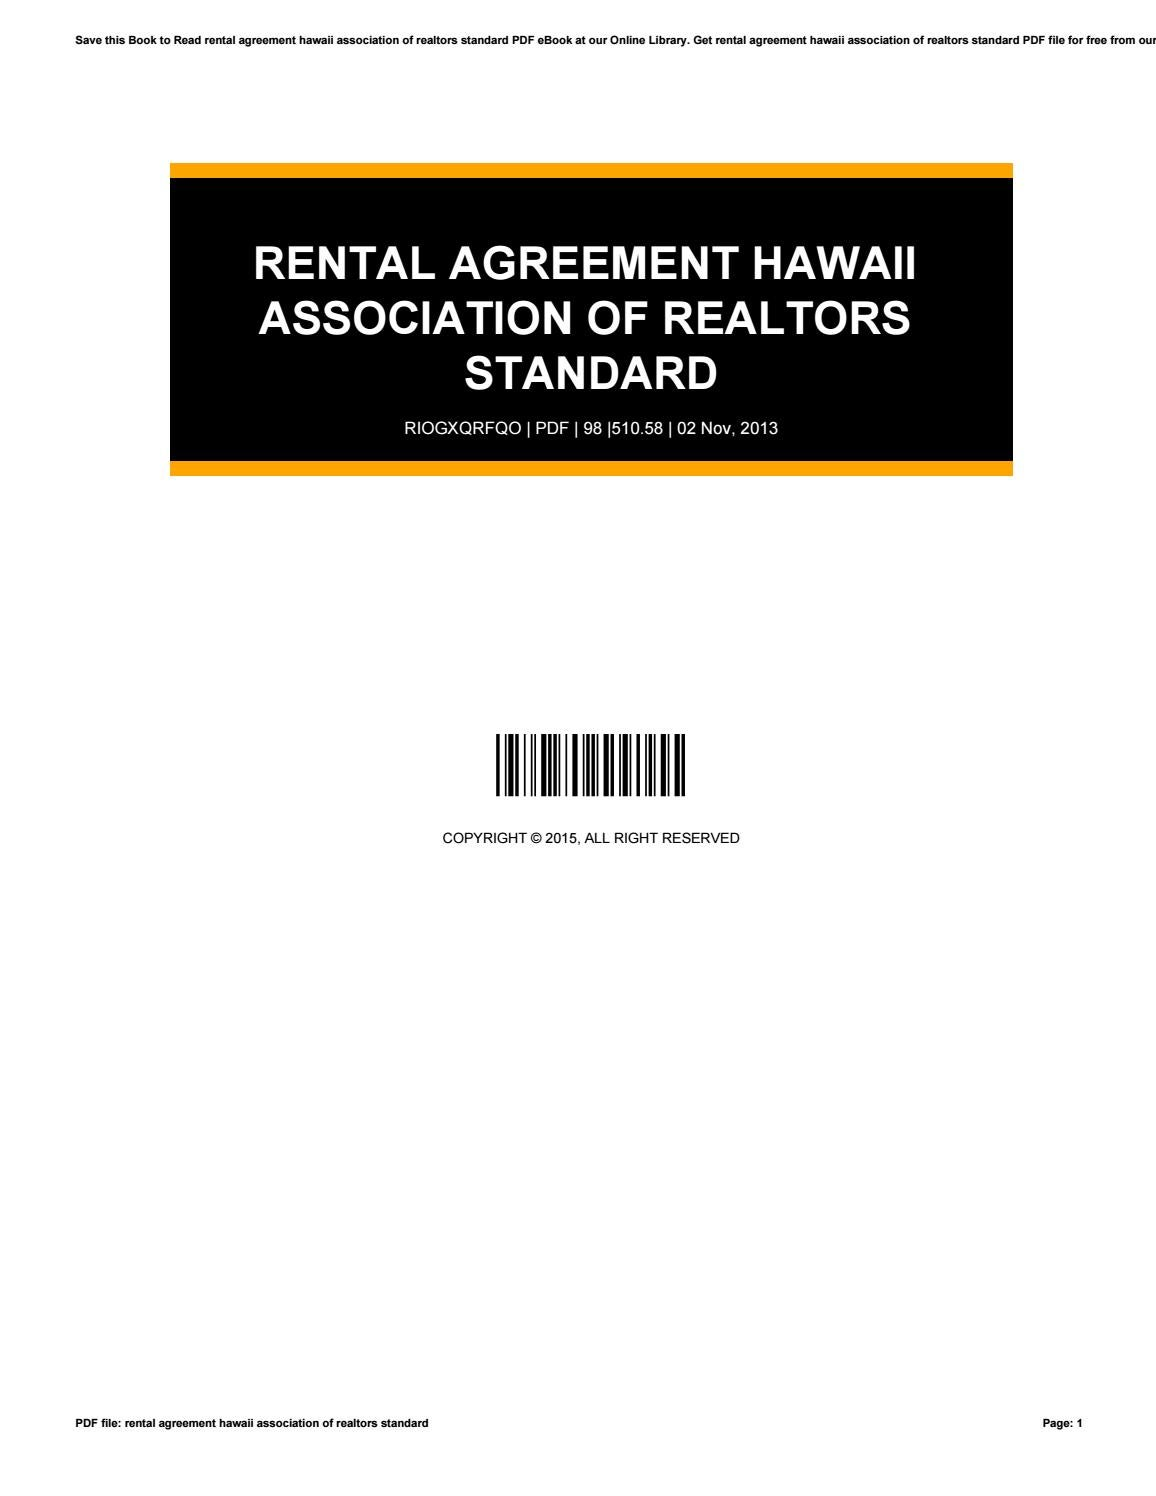 Rental Agreement Hawaii Association Of Realtors Standard By